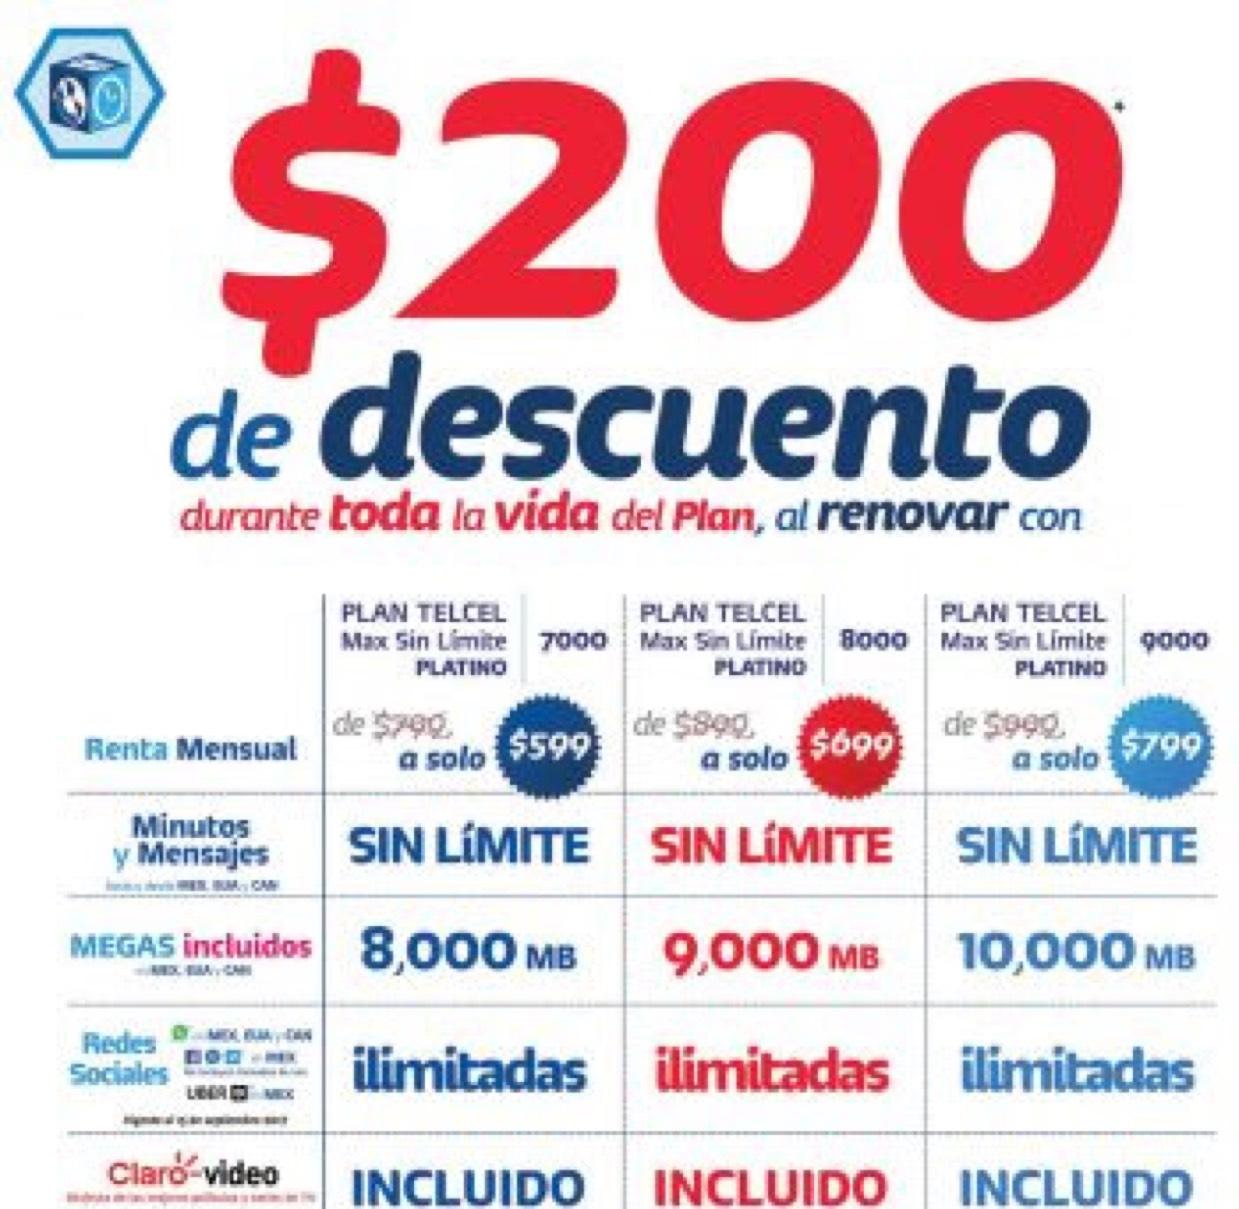 Plan max sin límite platino Telcel